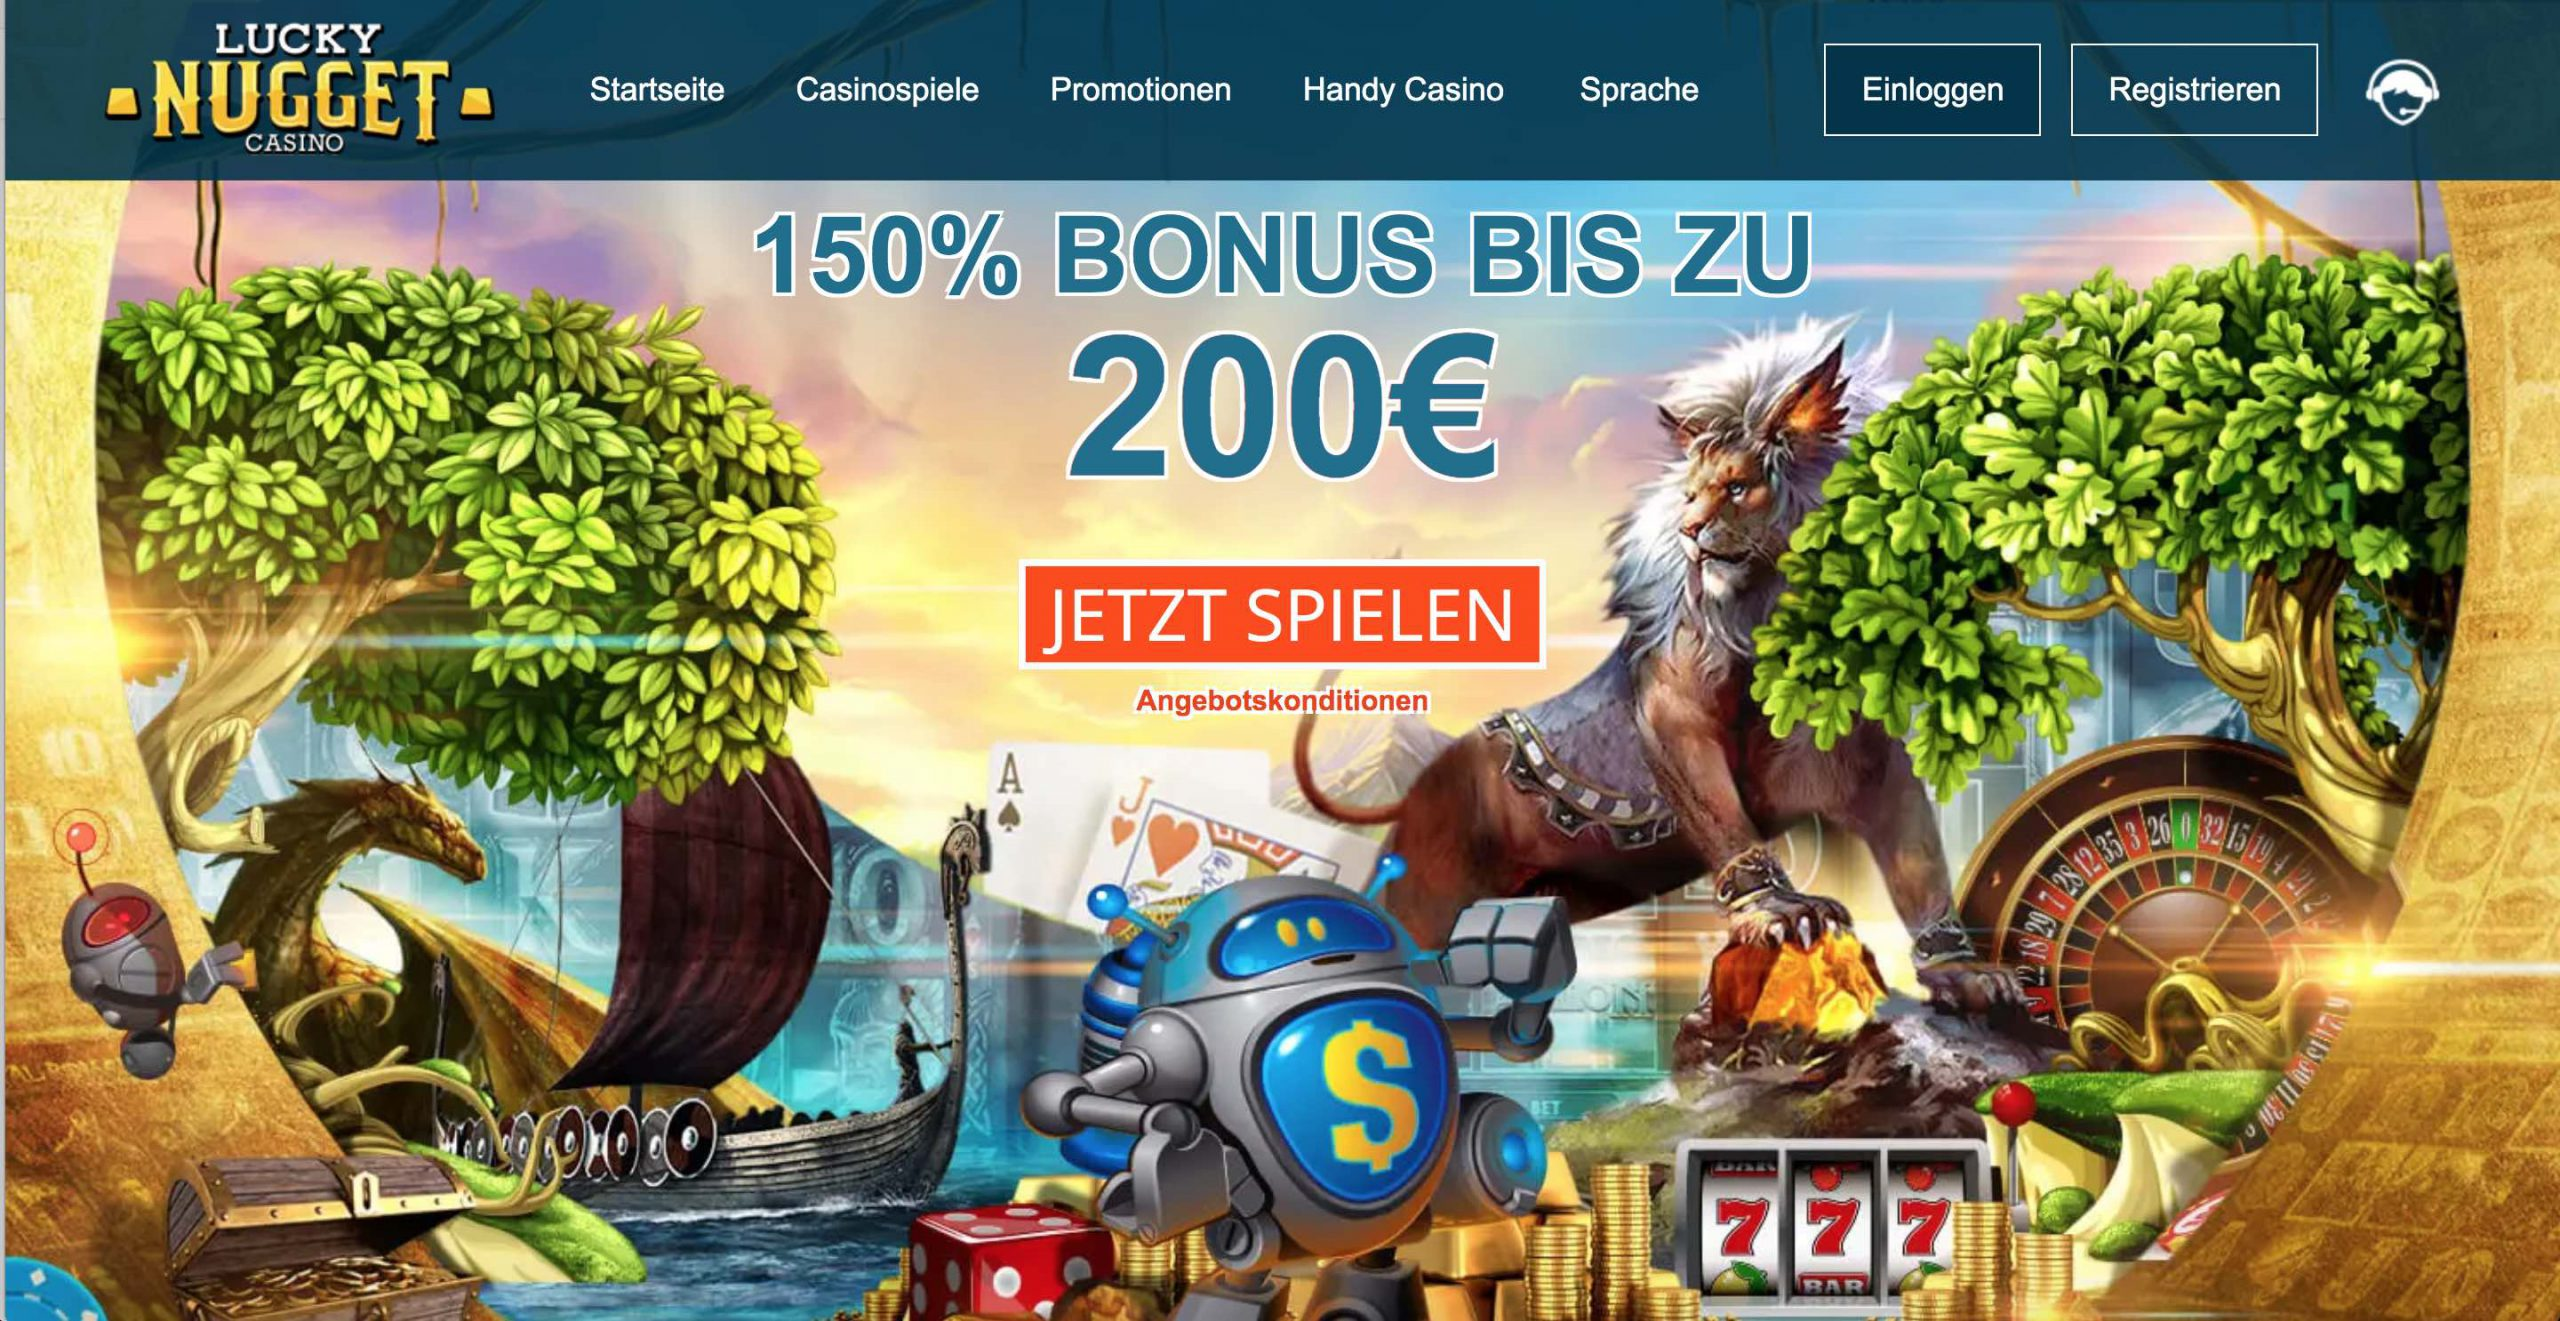 Lucky Nugget Erfahrungen - Lucky Nugget Casino Bonus Bis Zu 200 €